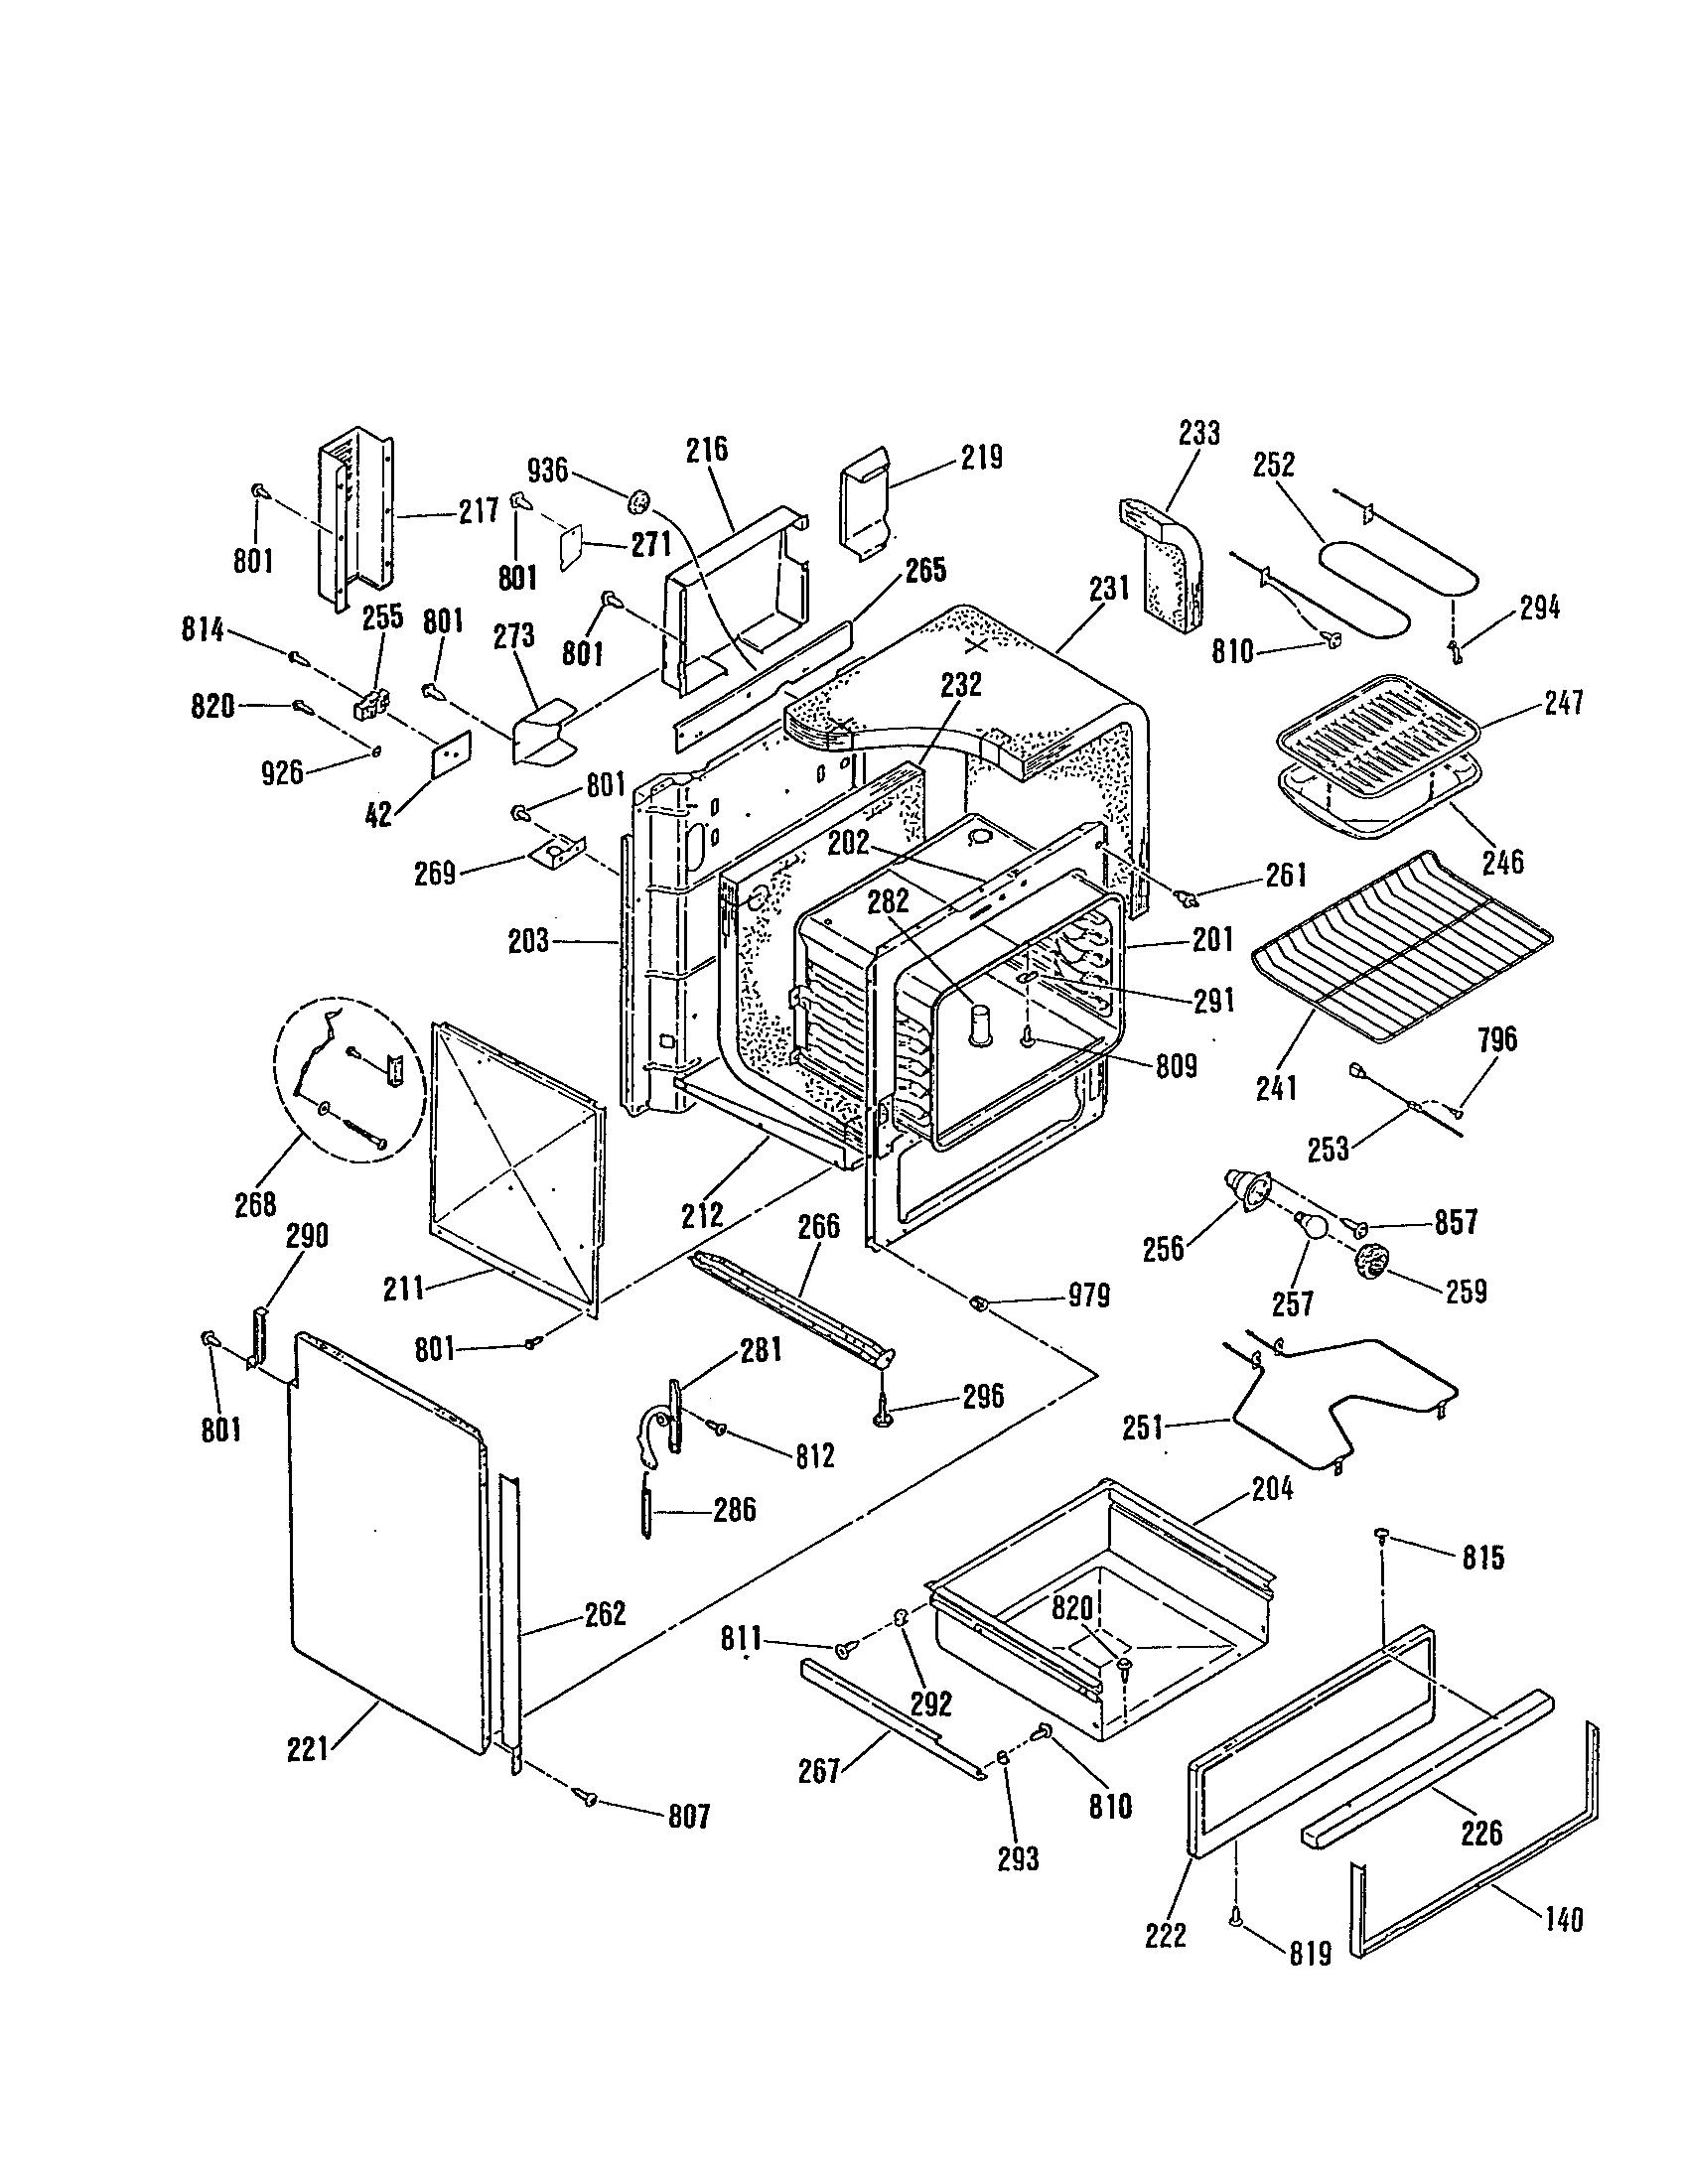 Ge Oven Wiring Diagram Jdp37 Library